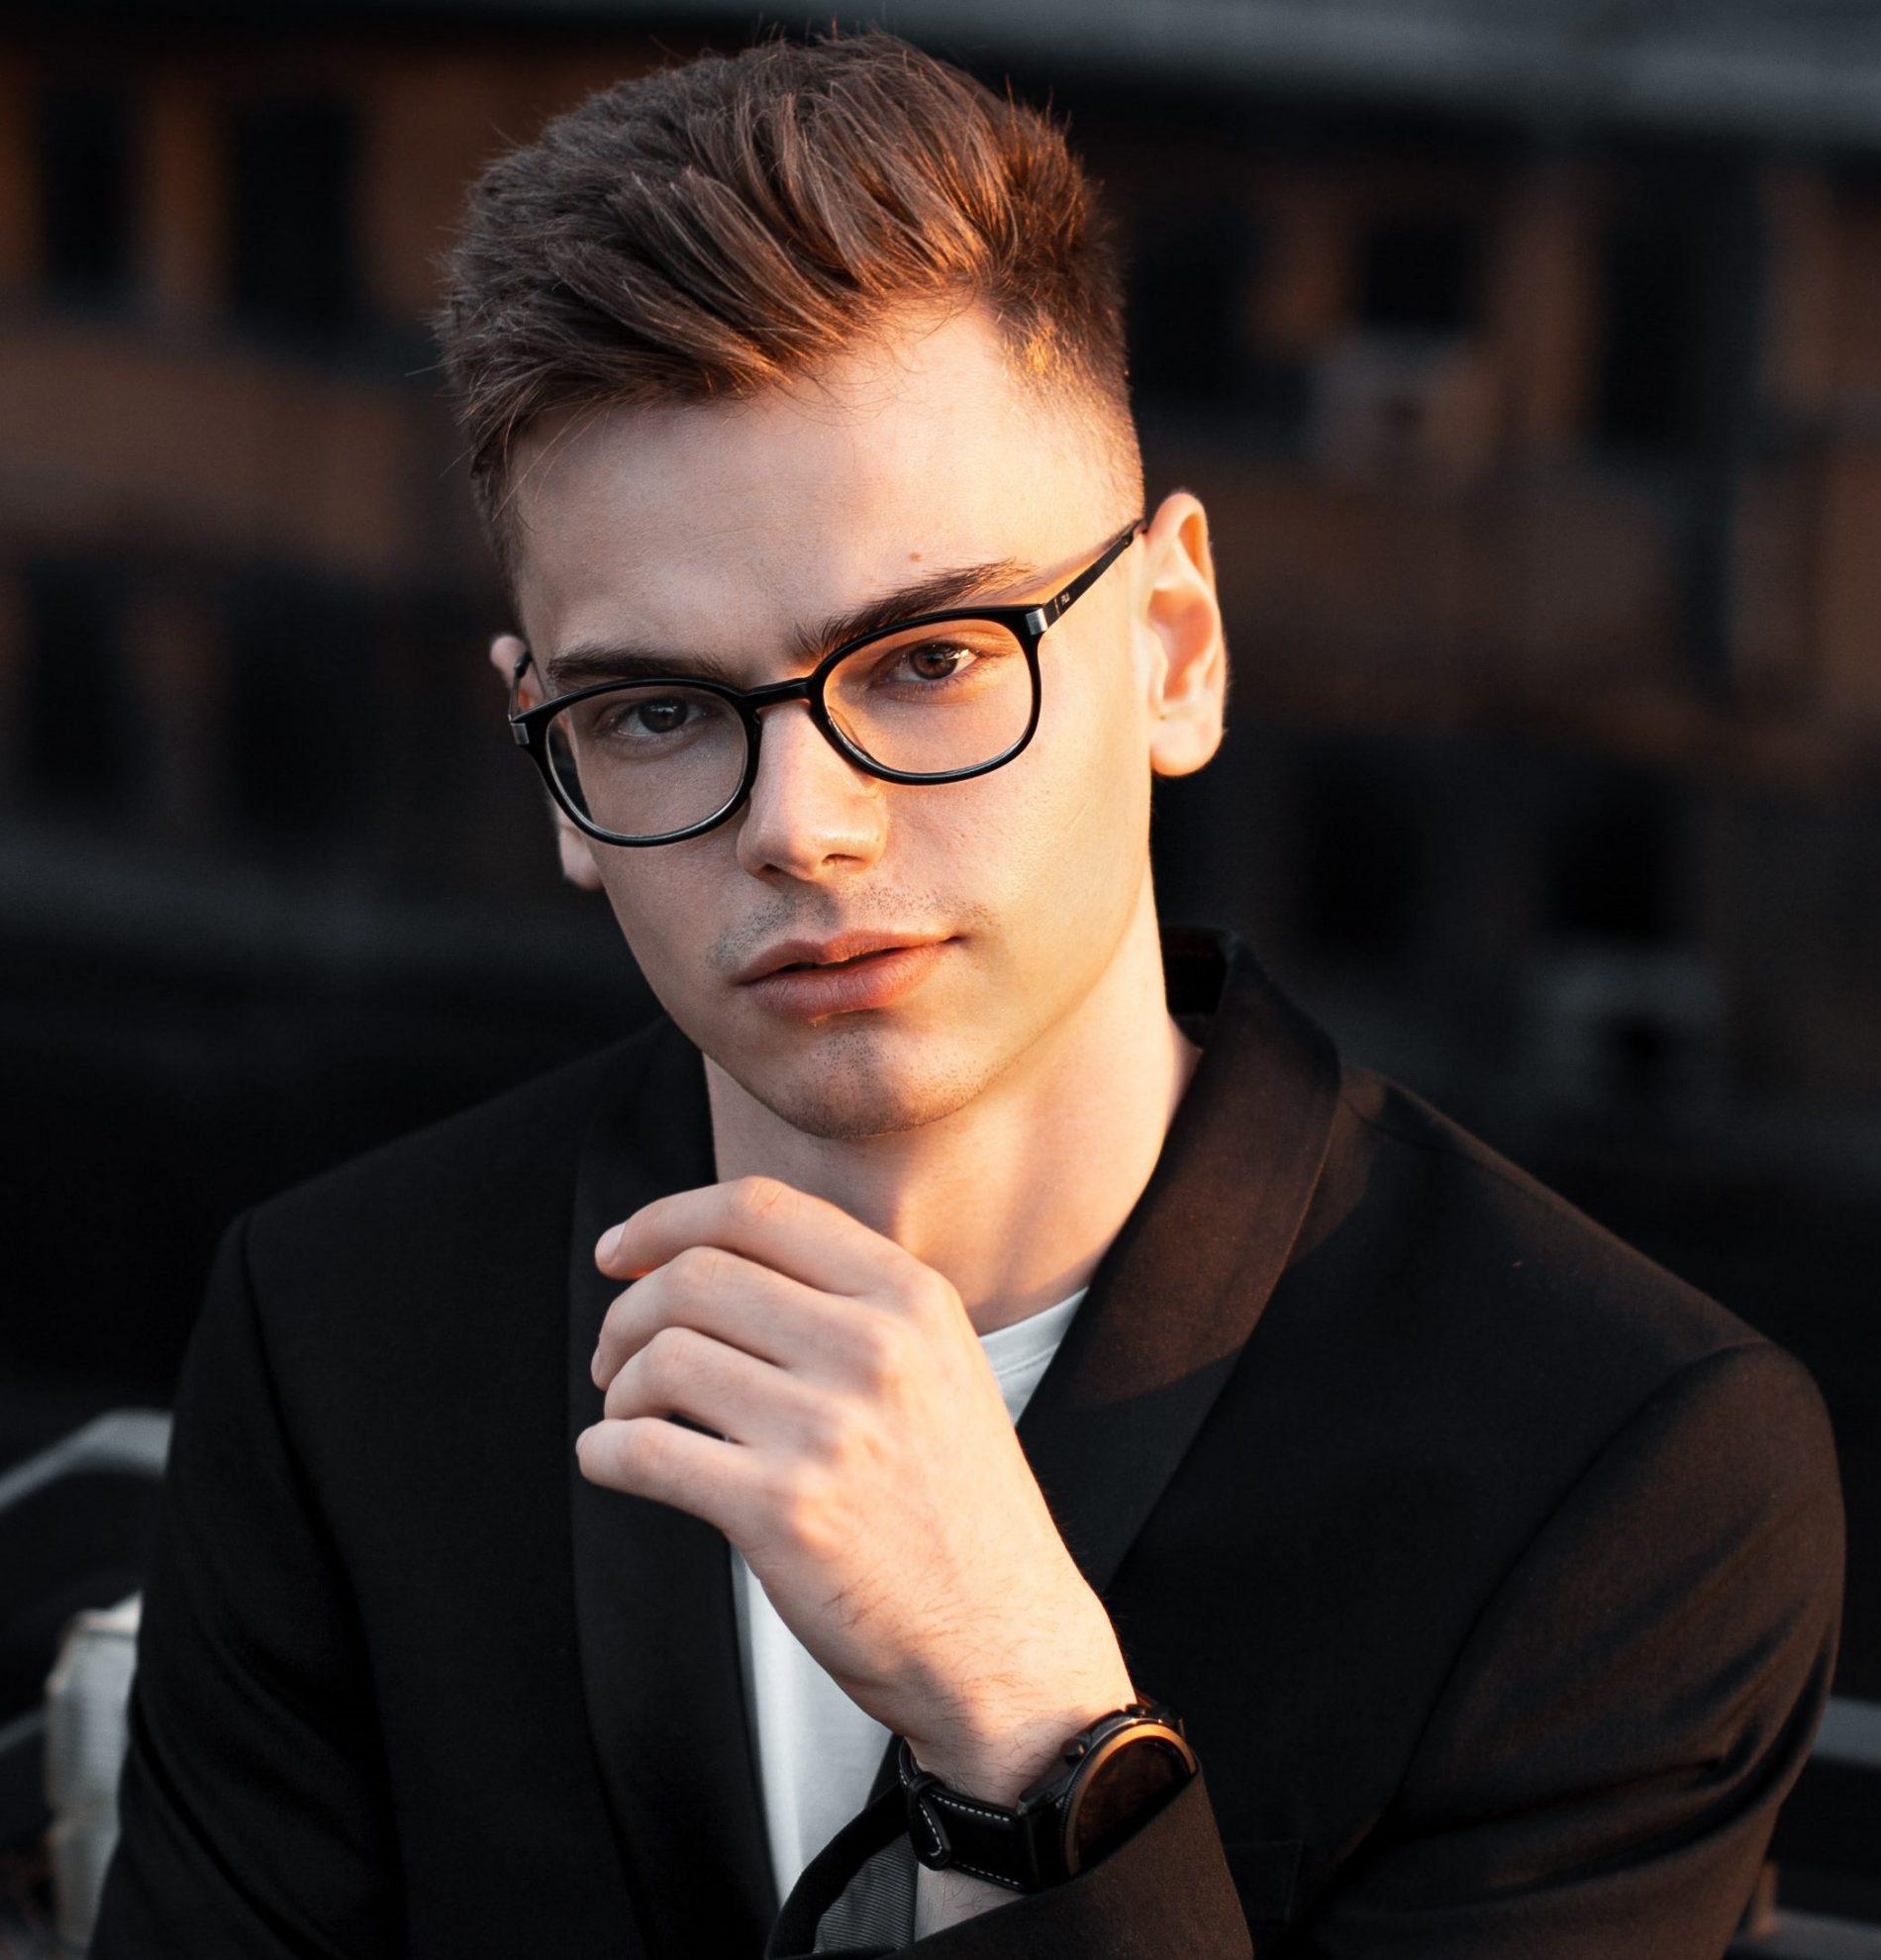 Maximilian Ioan